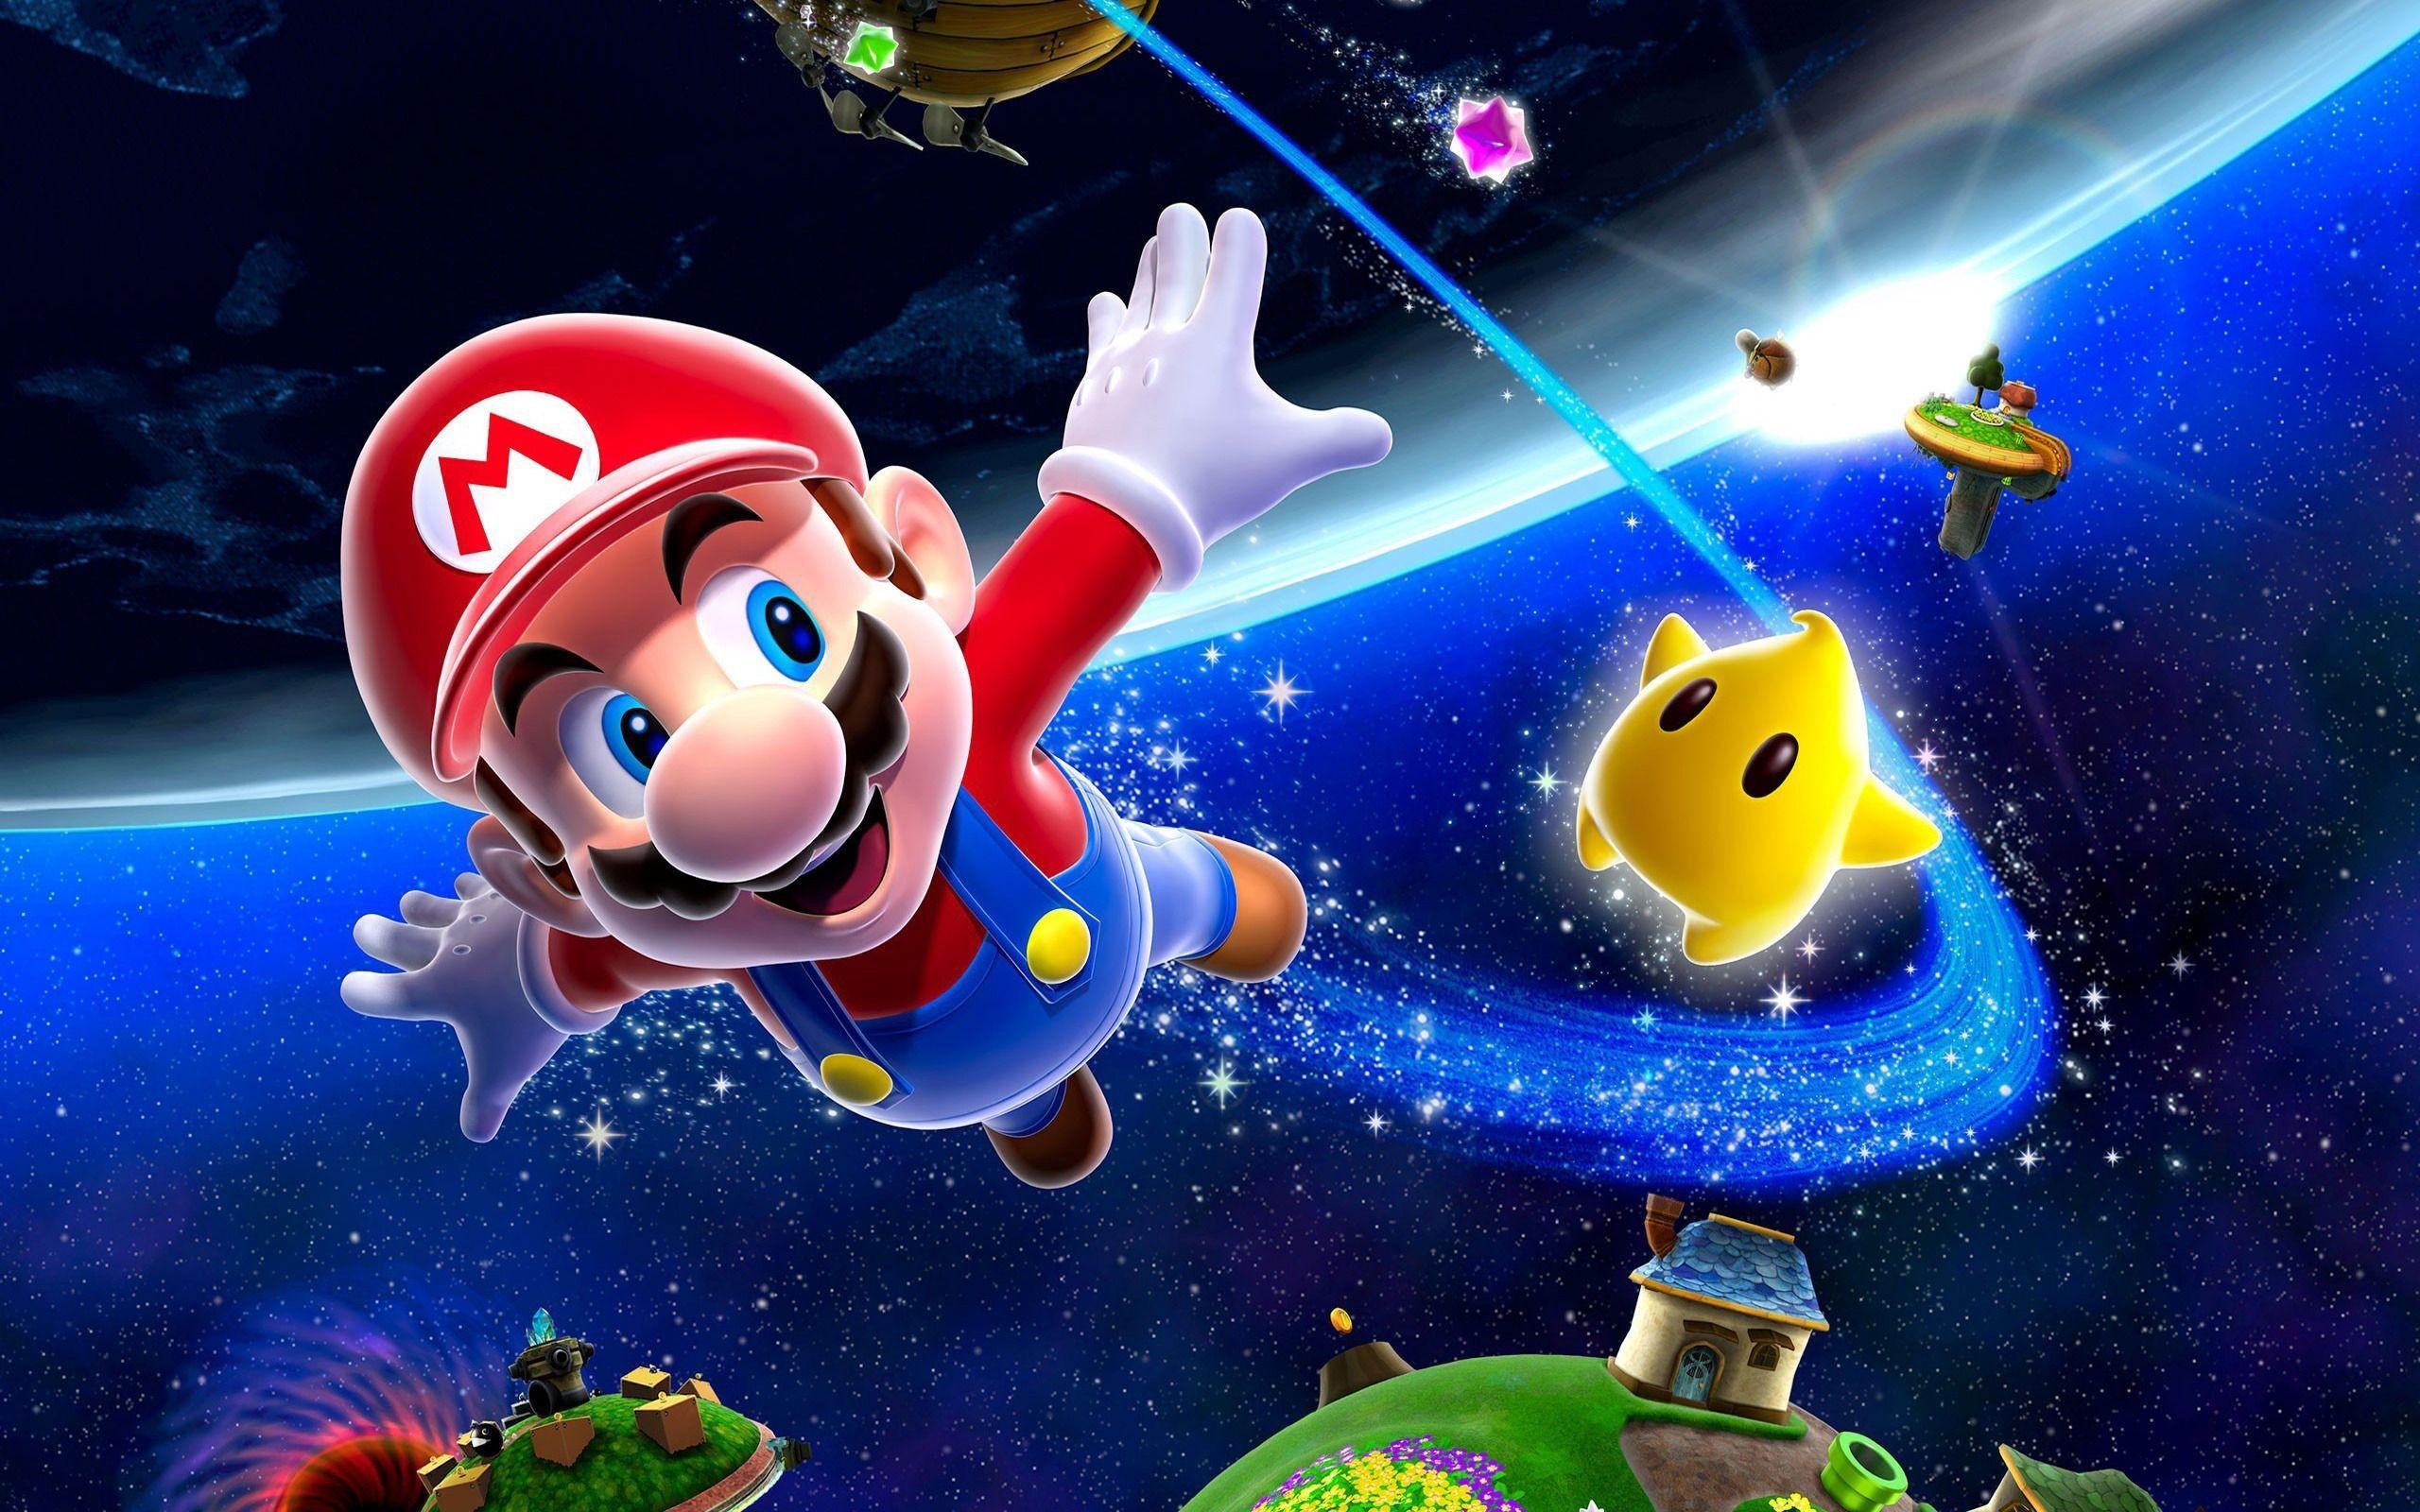 Super-Mario-Galaxy-Game-Wallpaper-Desktop-Backgrounds.jpg